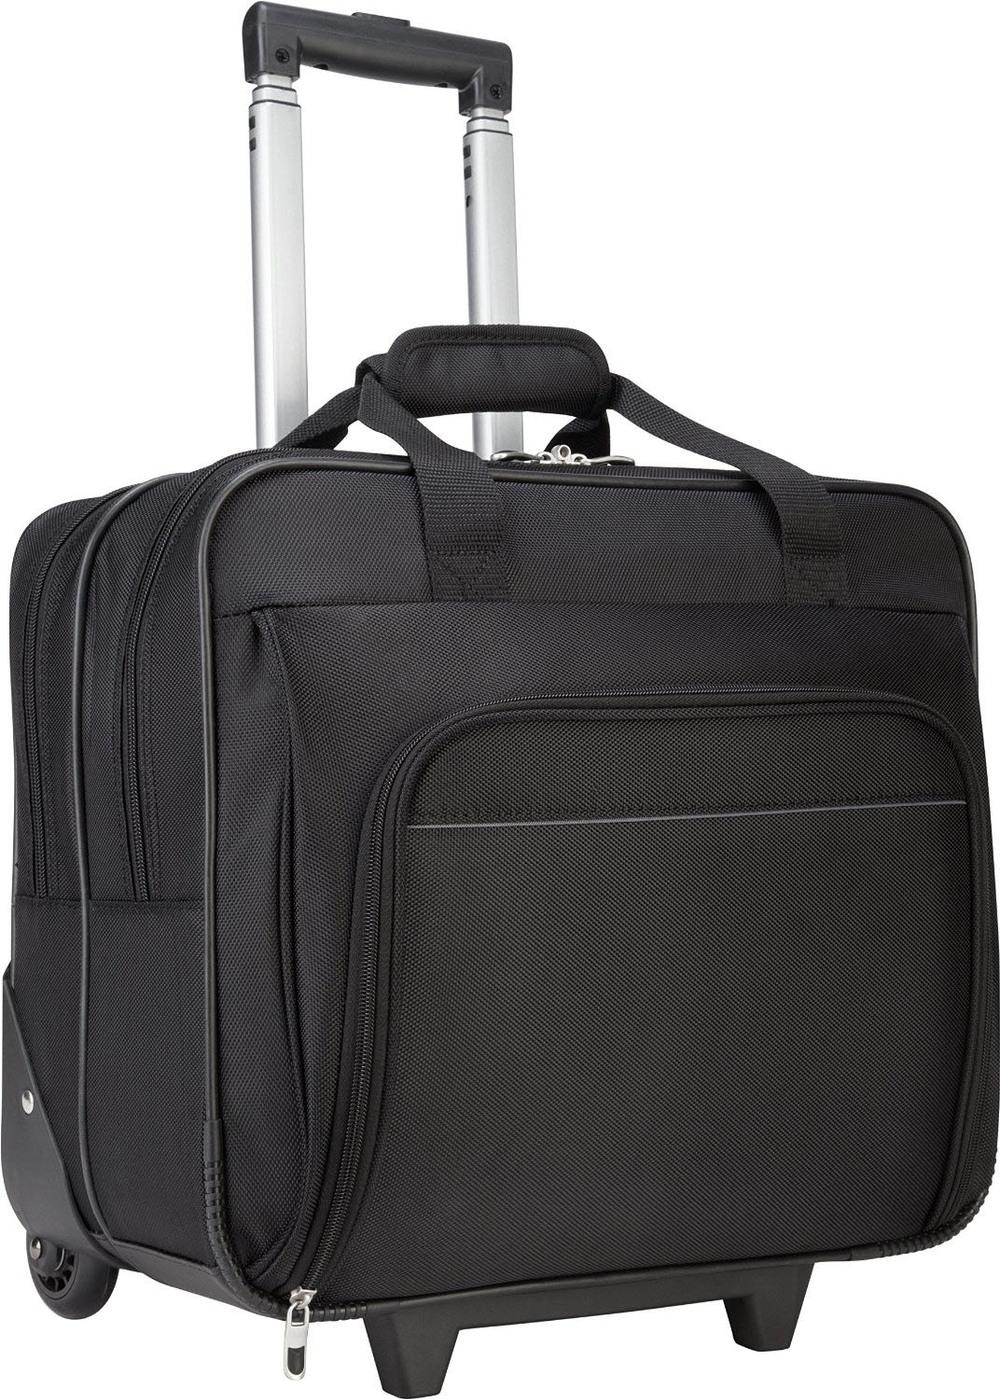 China Manufacturer Laptop Trolley Bag Roller Bag Laptop,Trolley ...